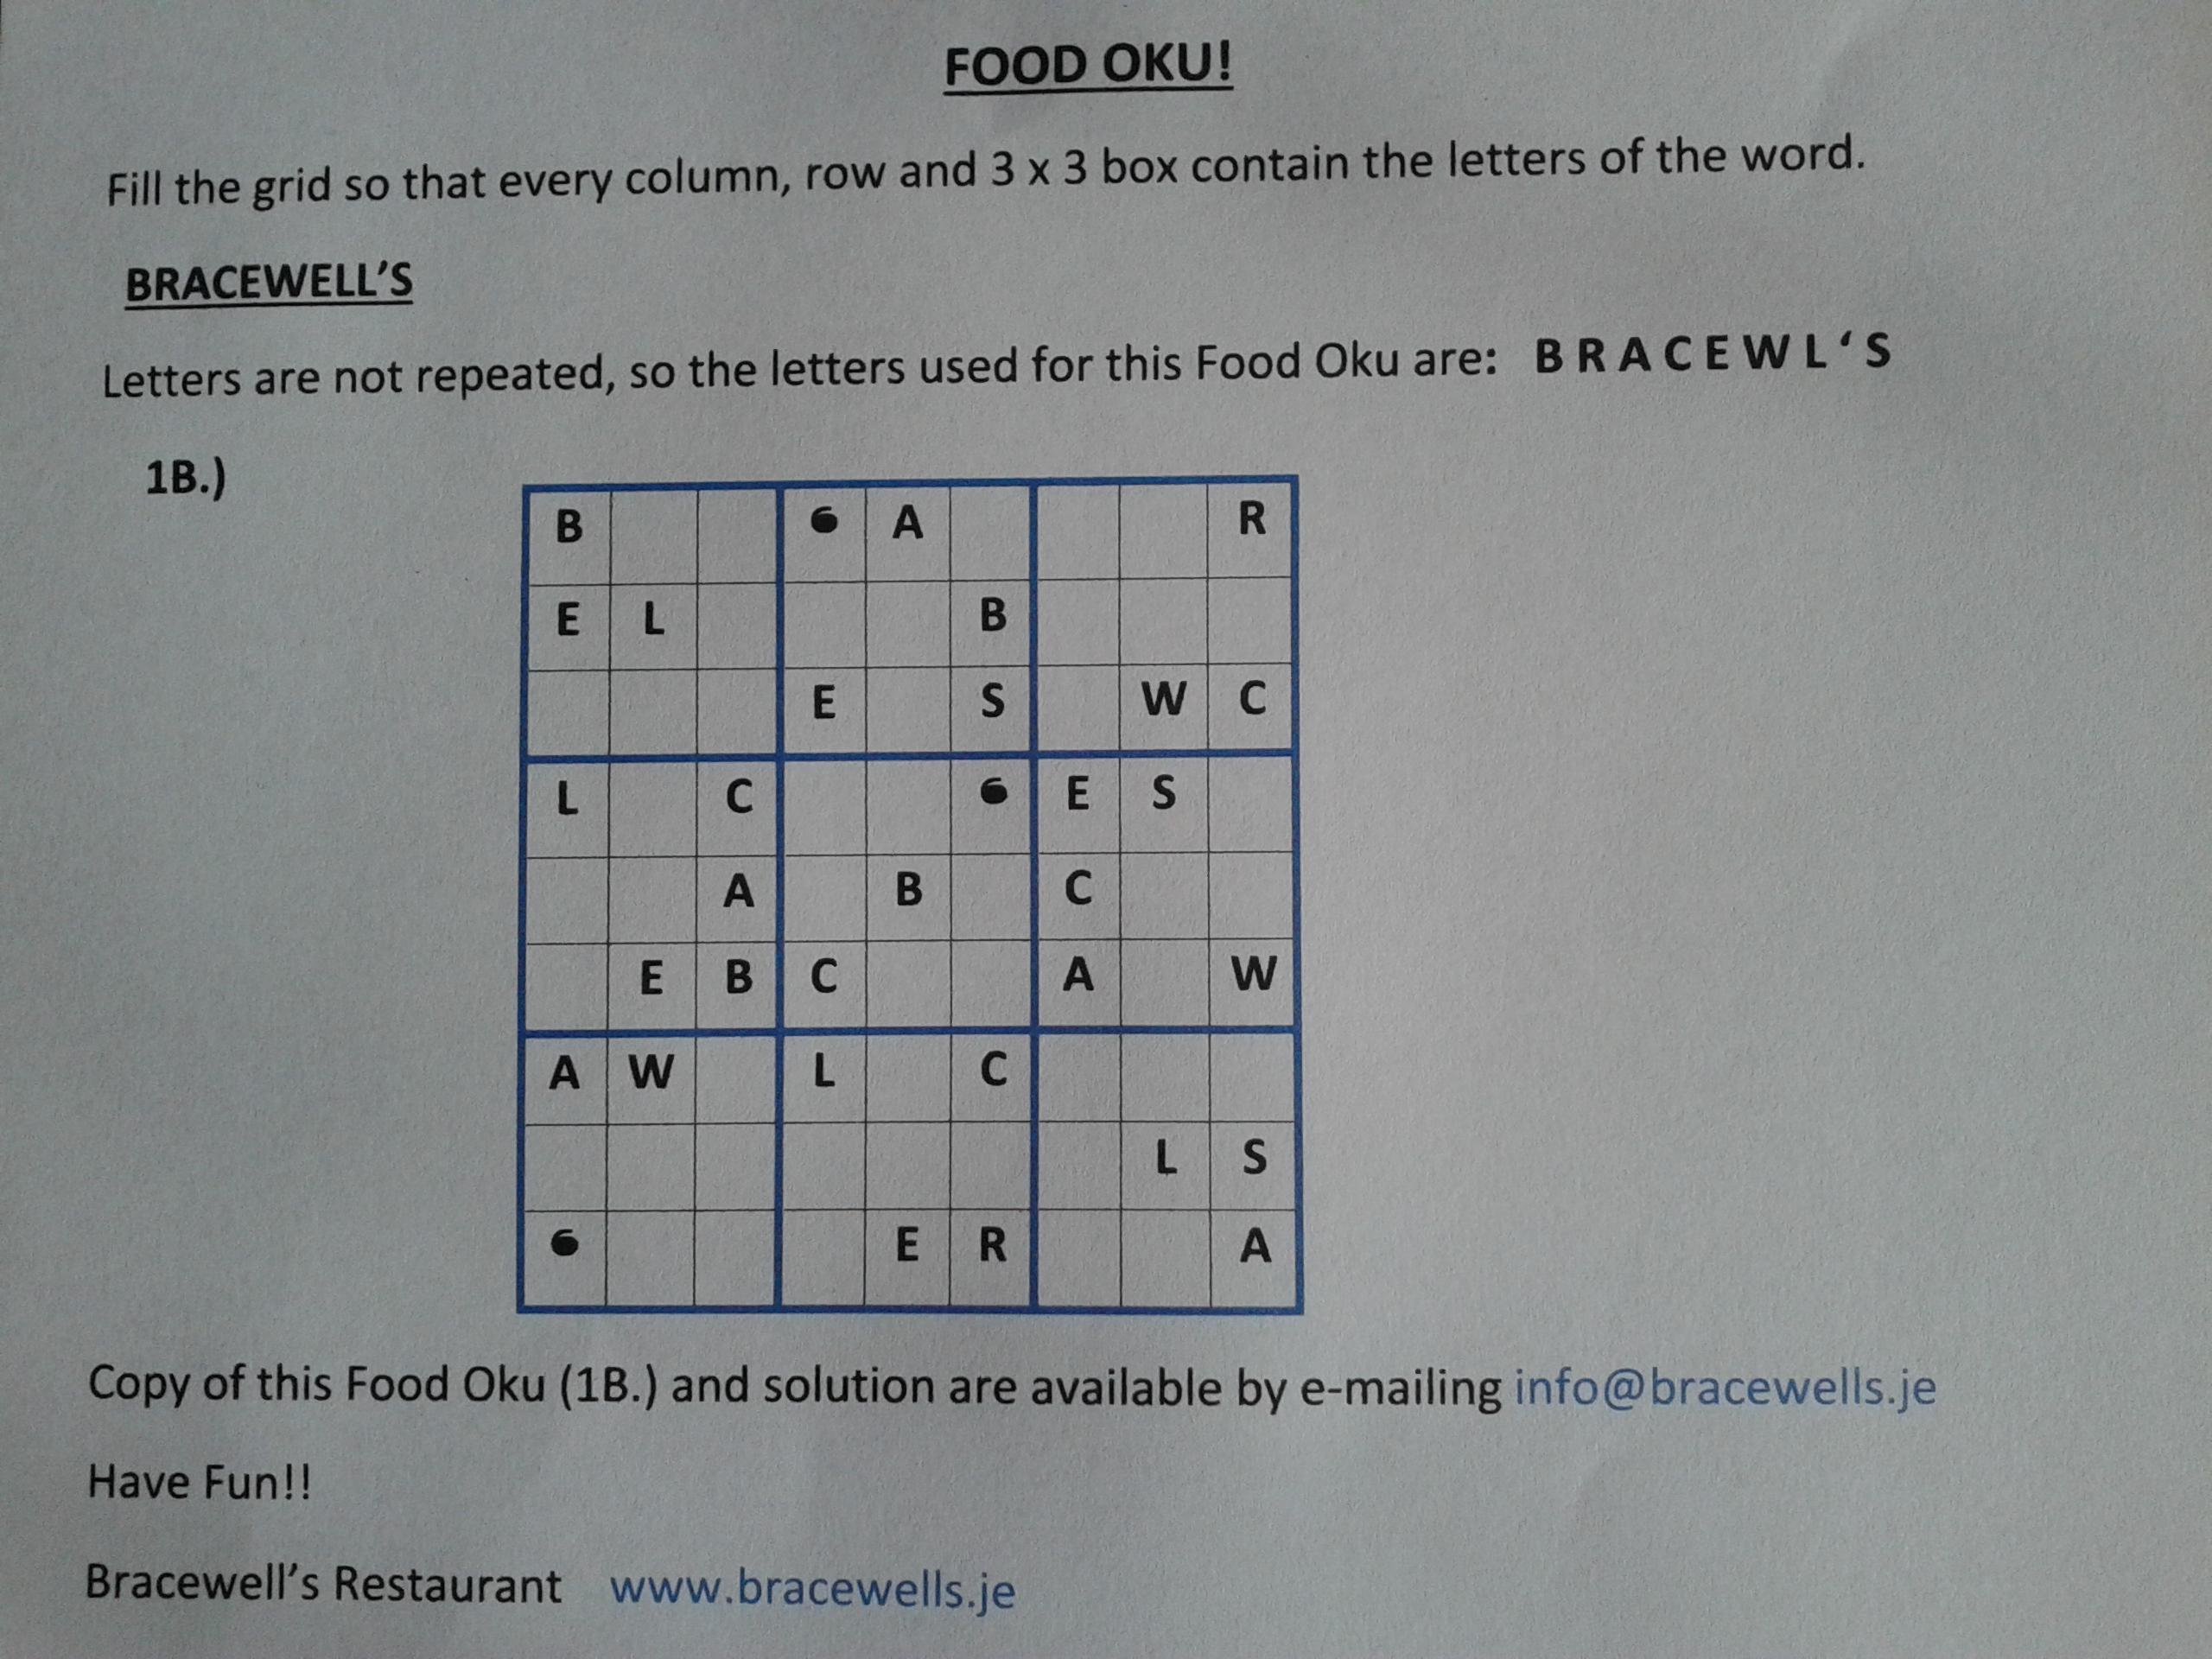 Food Oku!